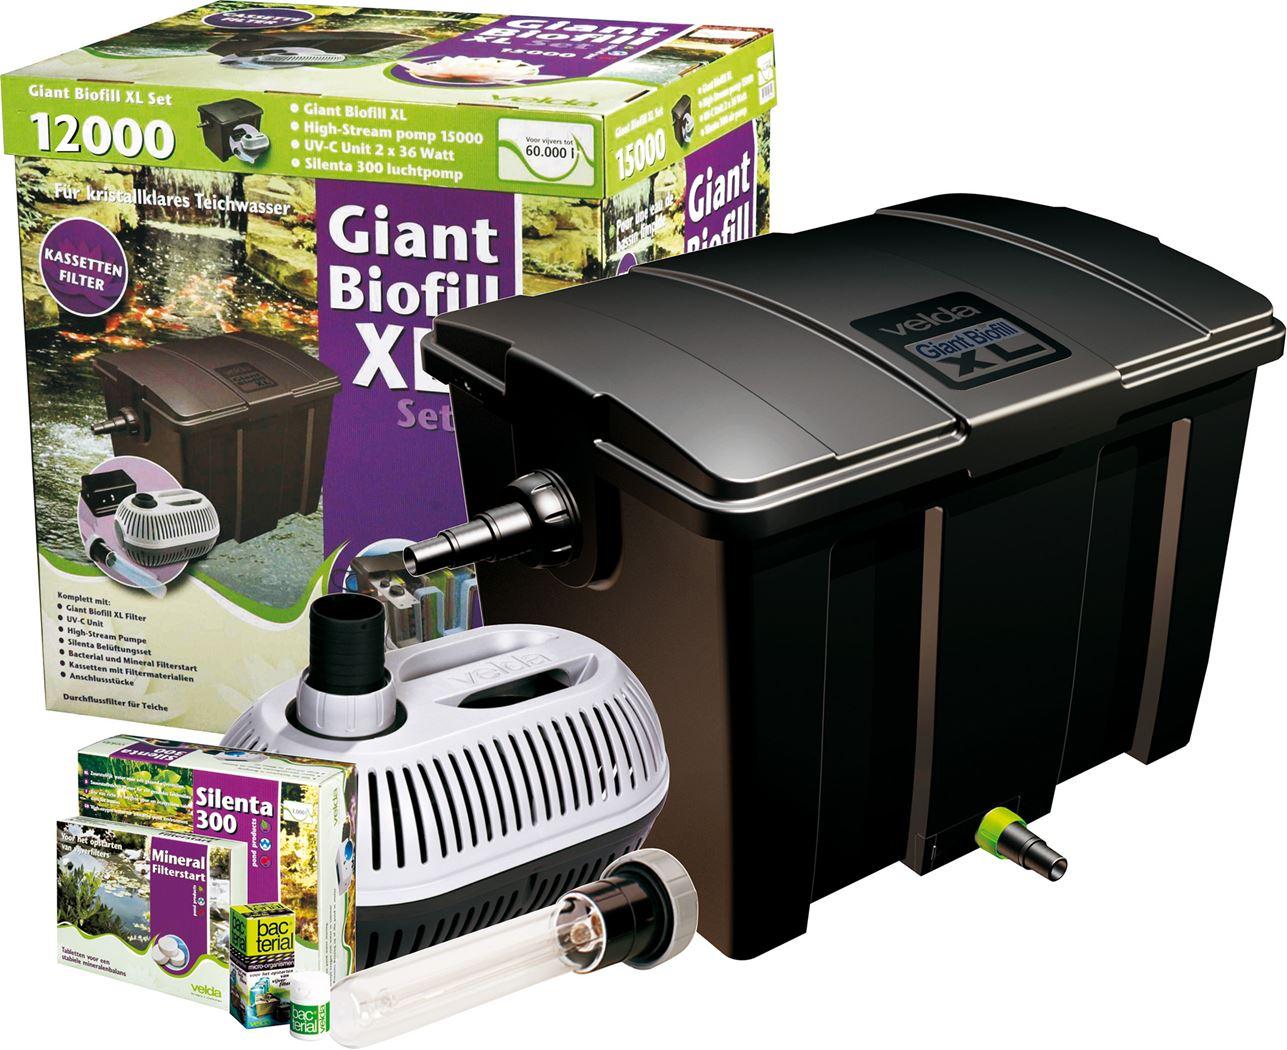 velda filter giant biofill xl set 40000